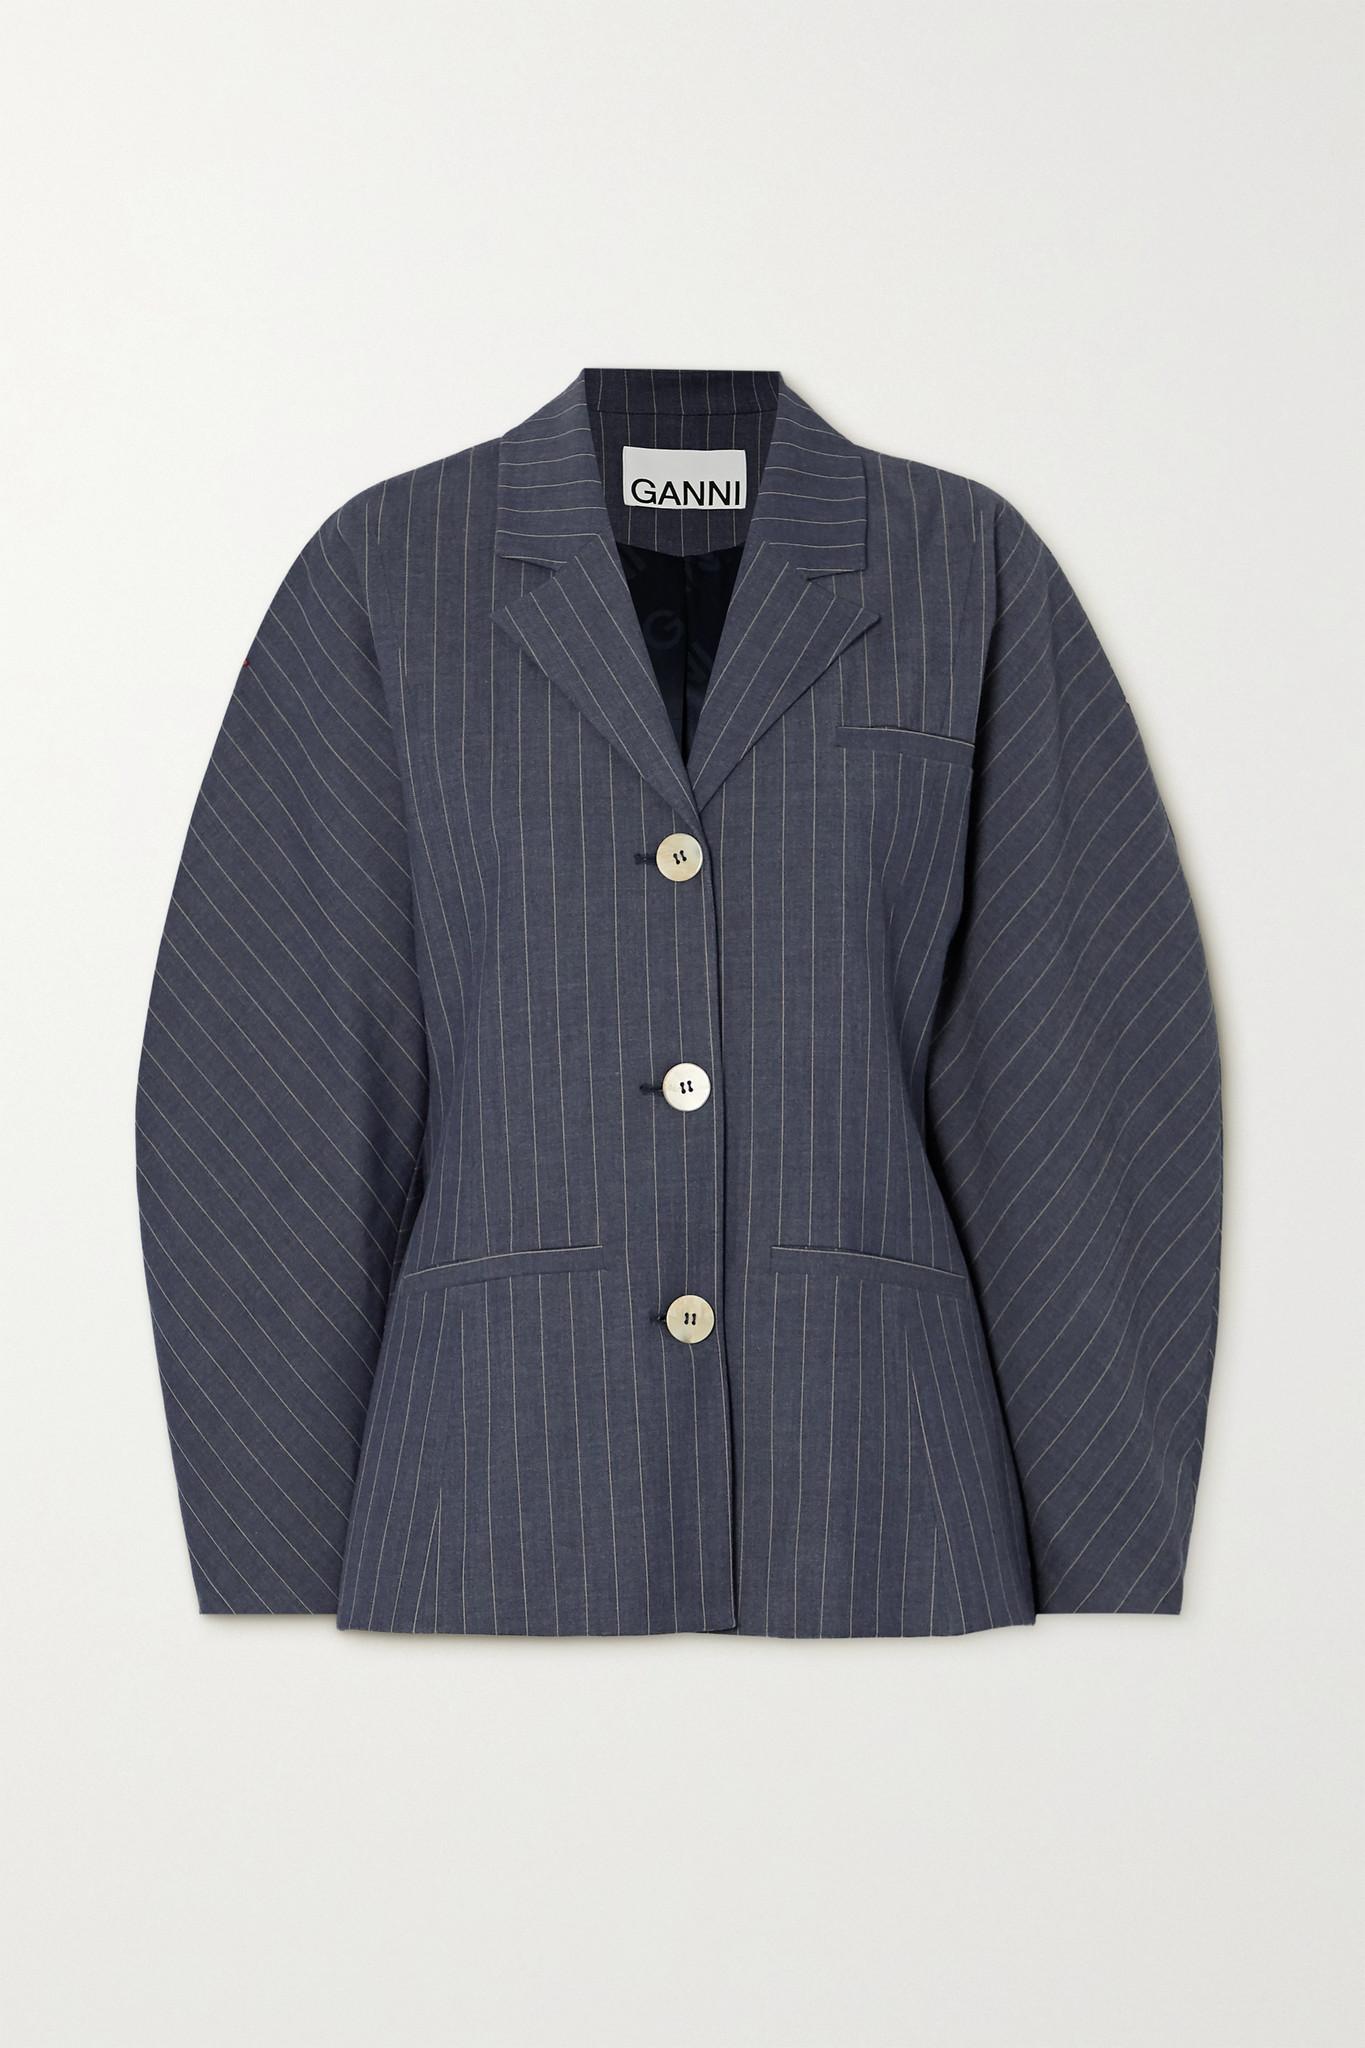 GANNI - Pinstriped Twill Blazer - Blue - DK36